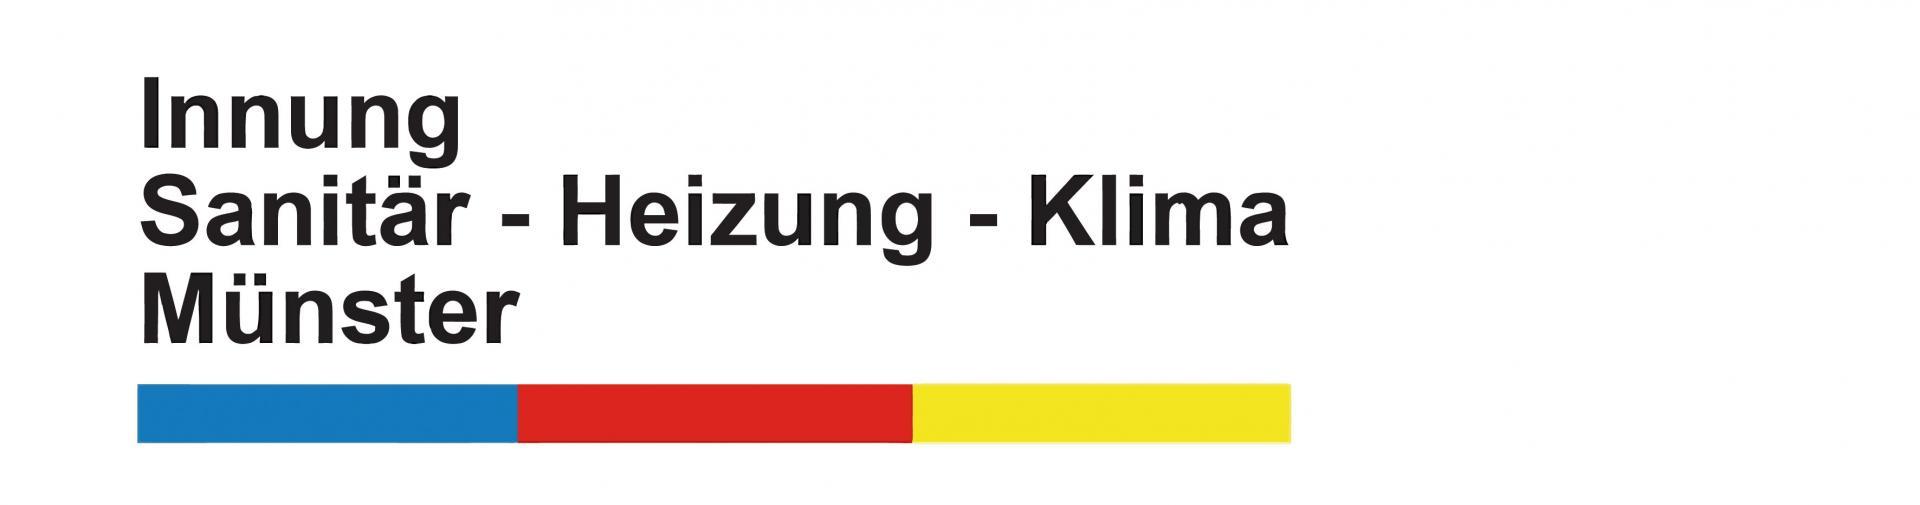 Innung Sanitär‐Heizung‐Klima Münster